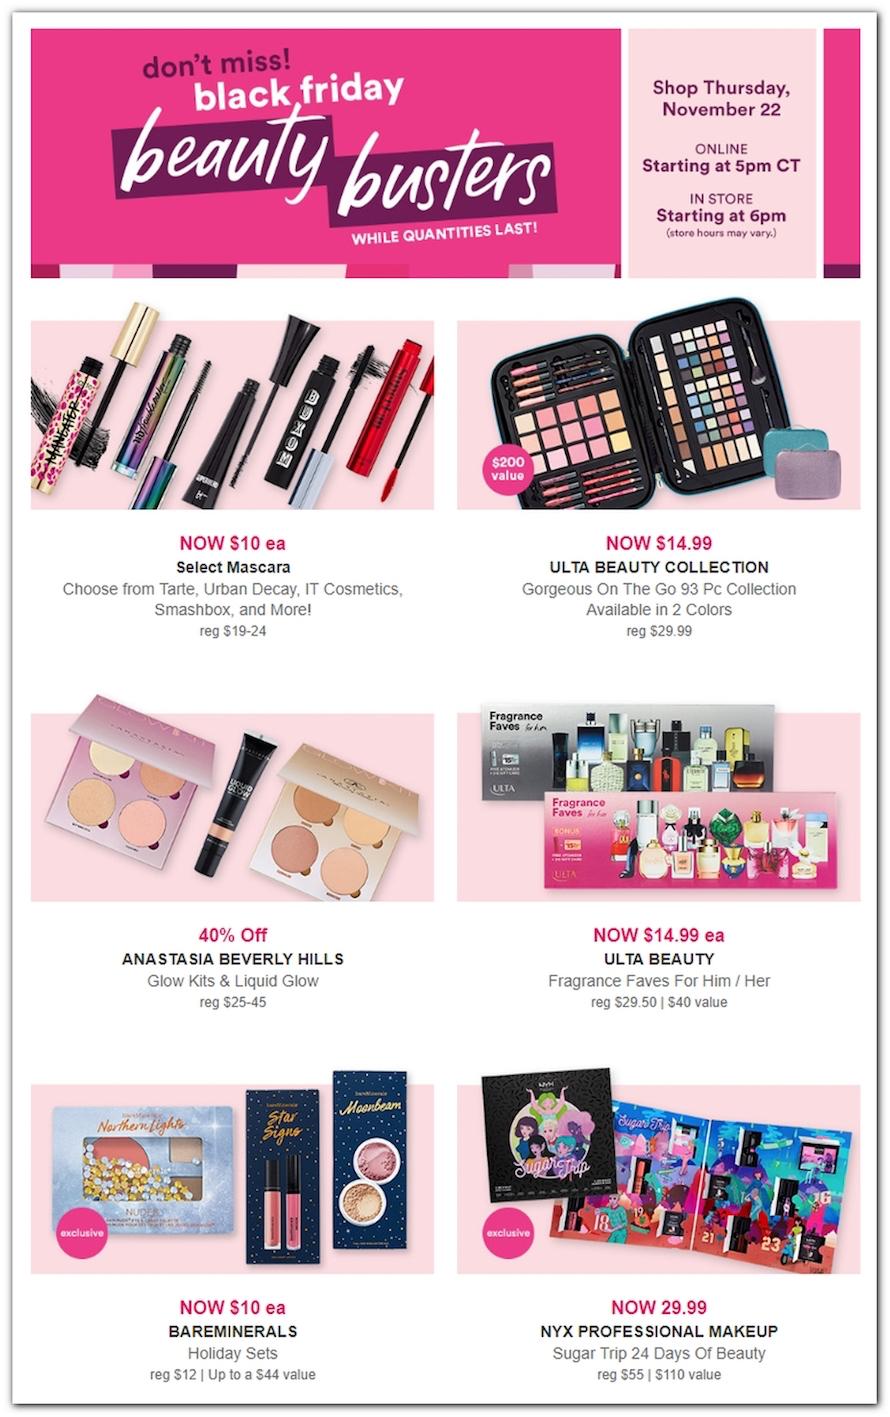 Ulta Black Friday 2018 Ad, Deals and Store Hours - NerdWallet